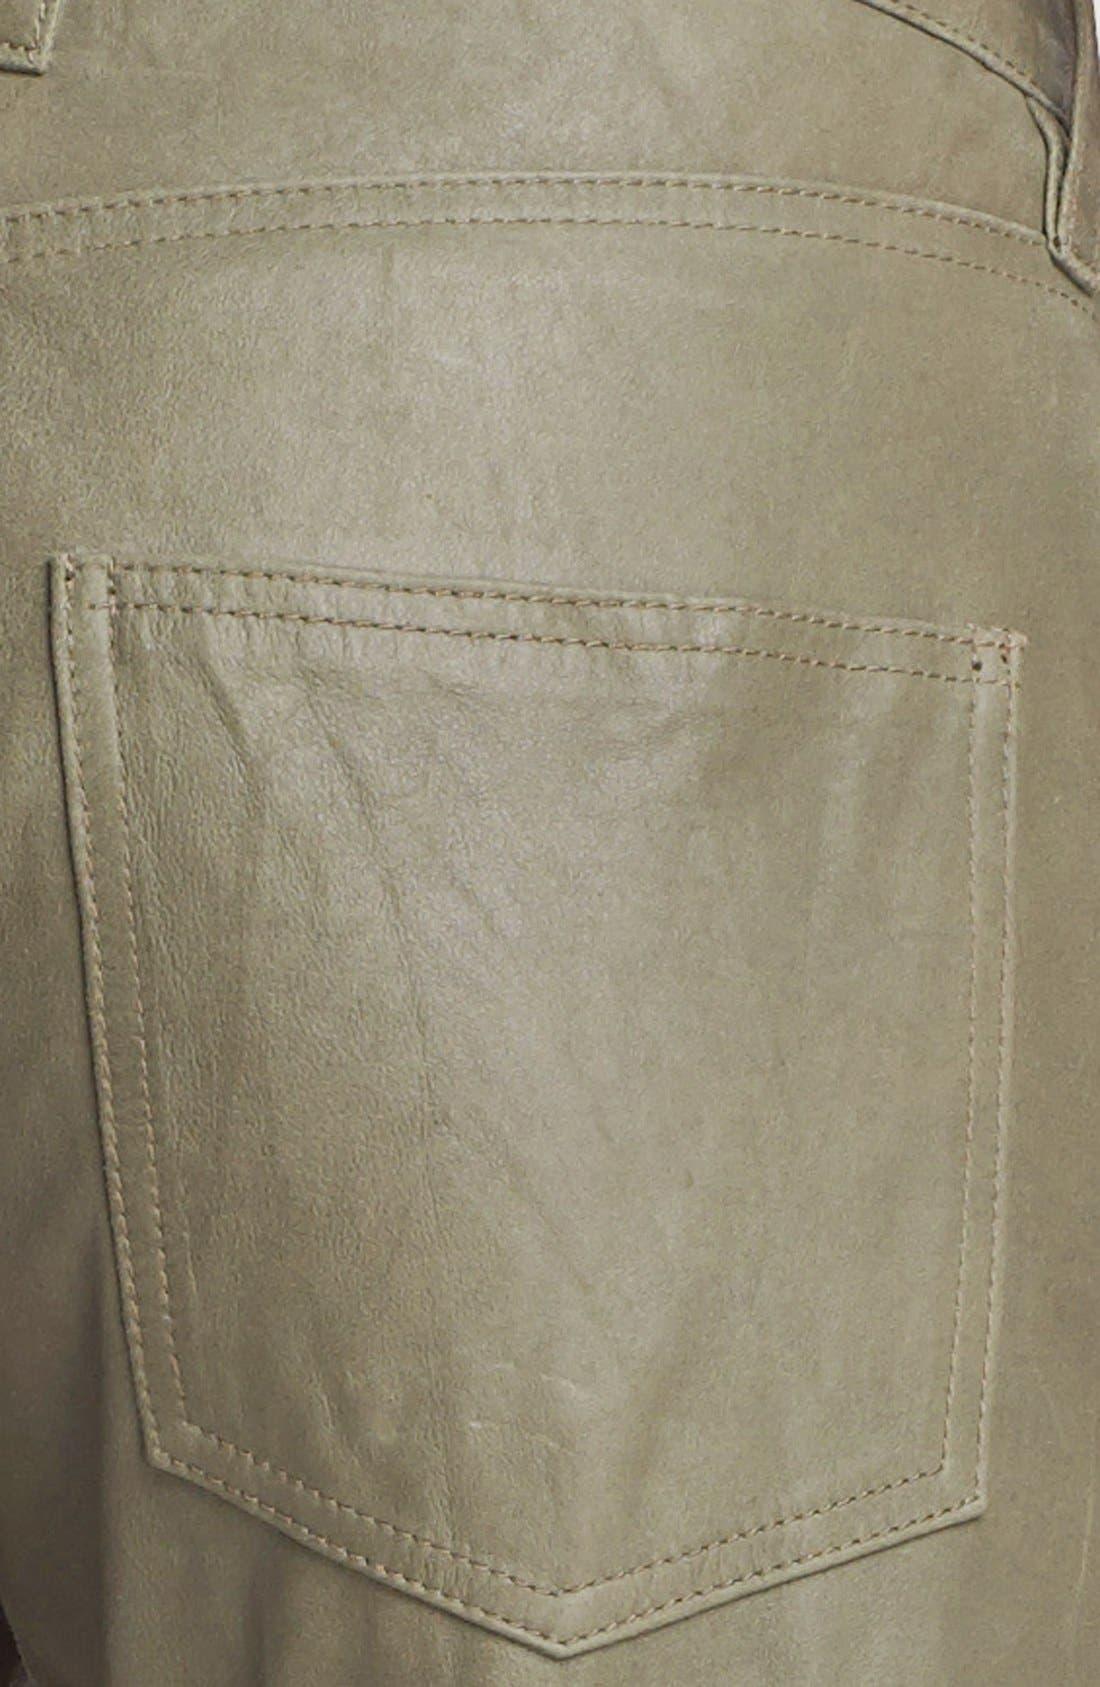 Alternate Image 2  - Current/Elliott 'The Boyfriend' Featherweight Leather Pants